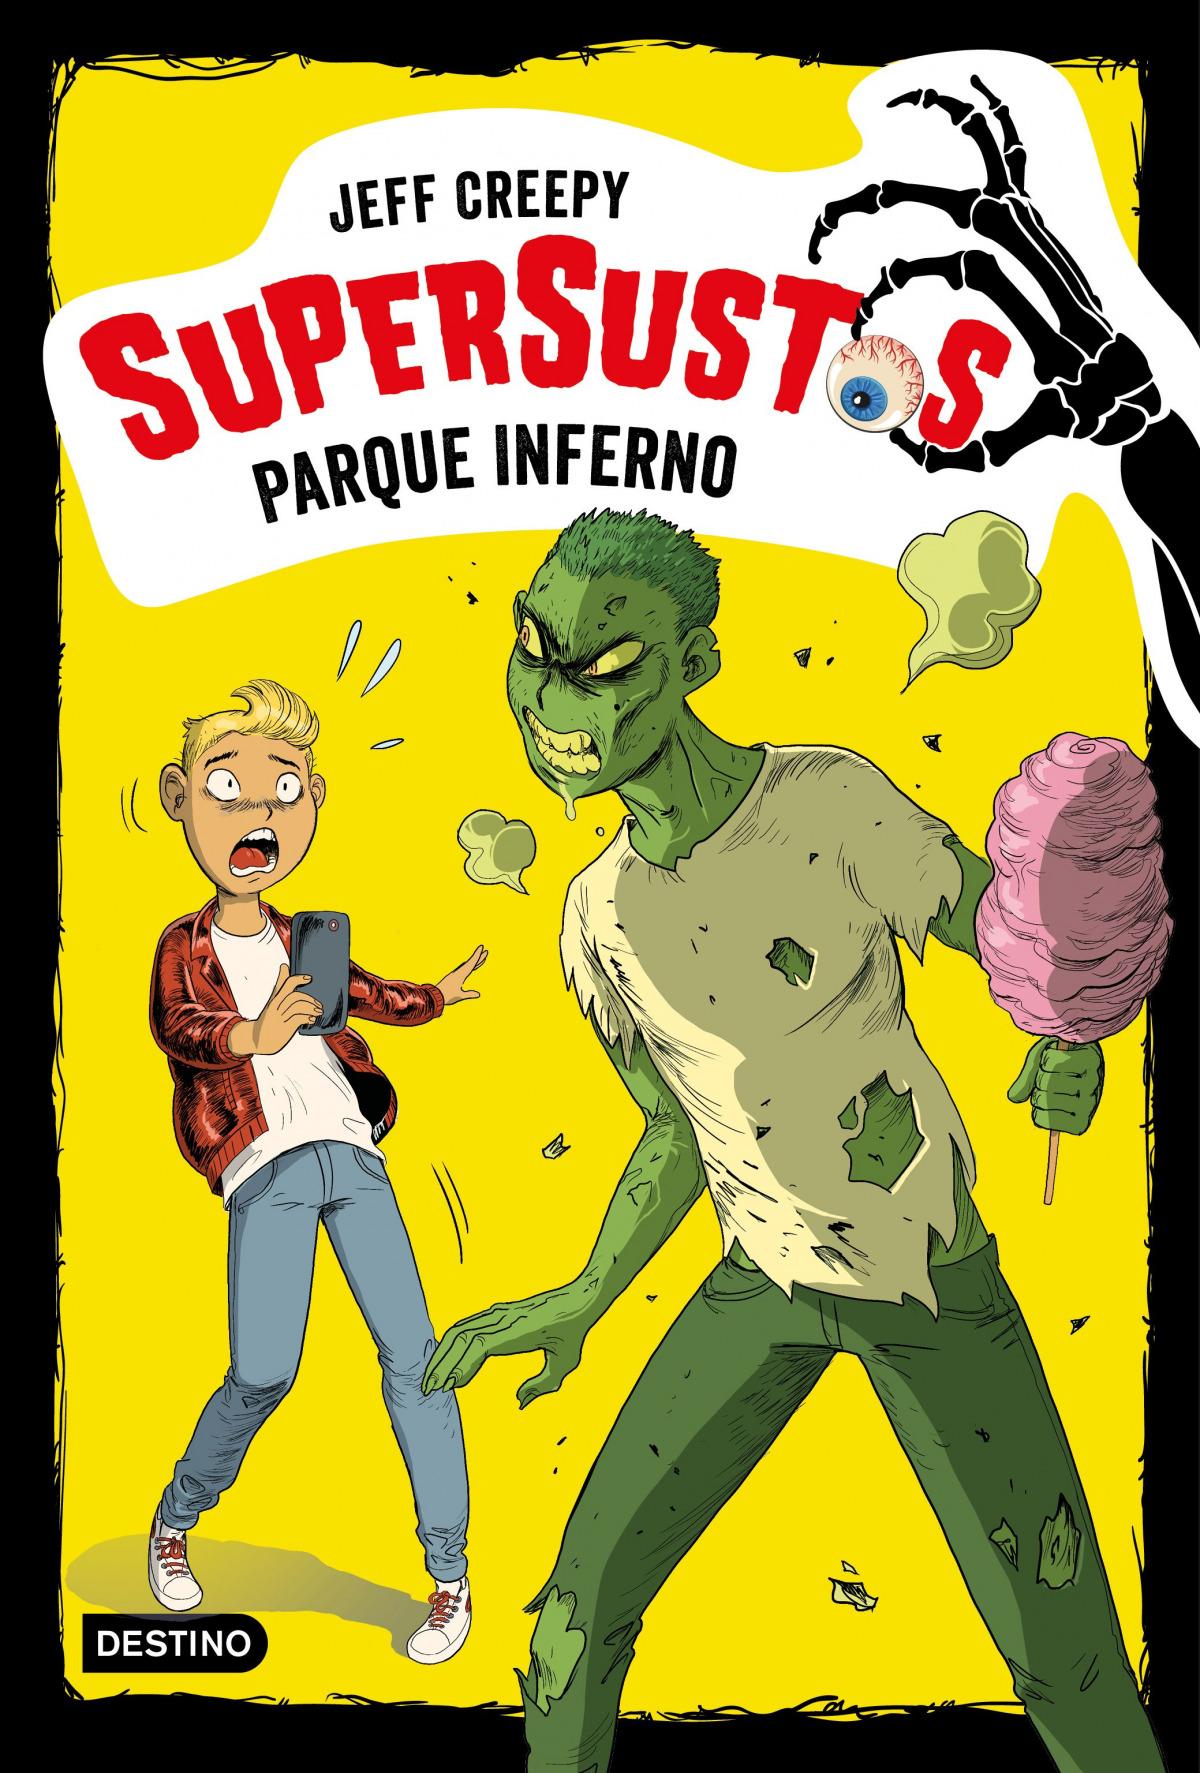 SUPERSUSTOS PARQUE INFIERNO